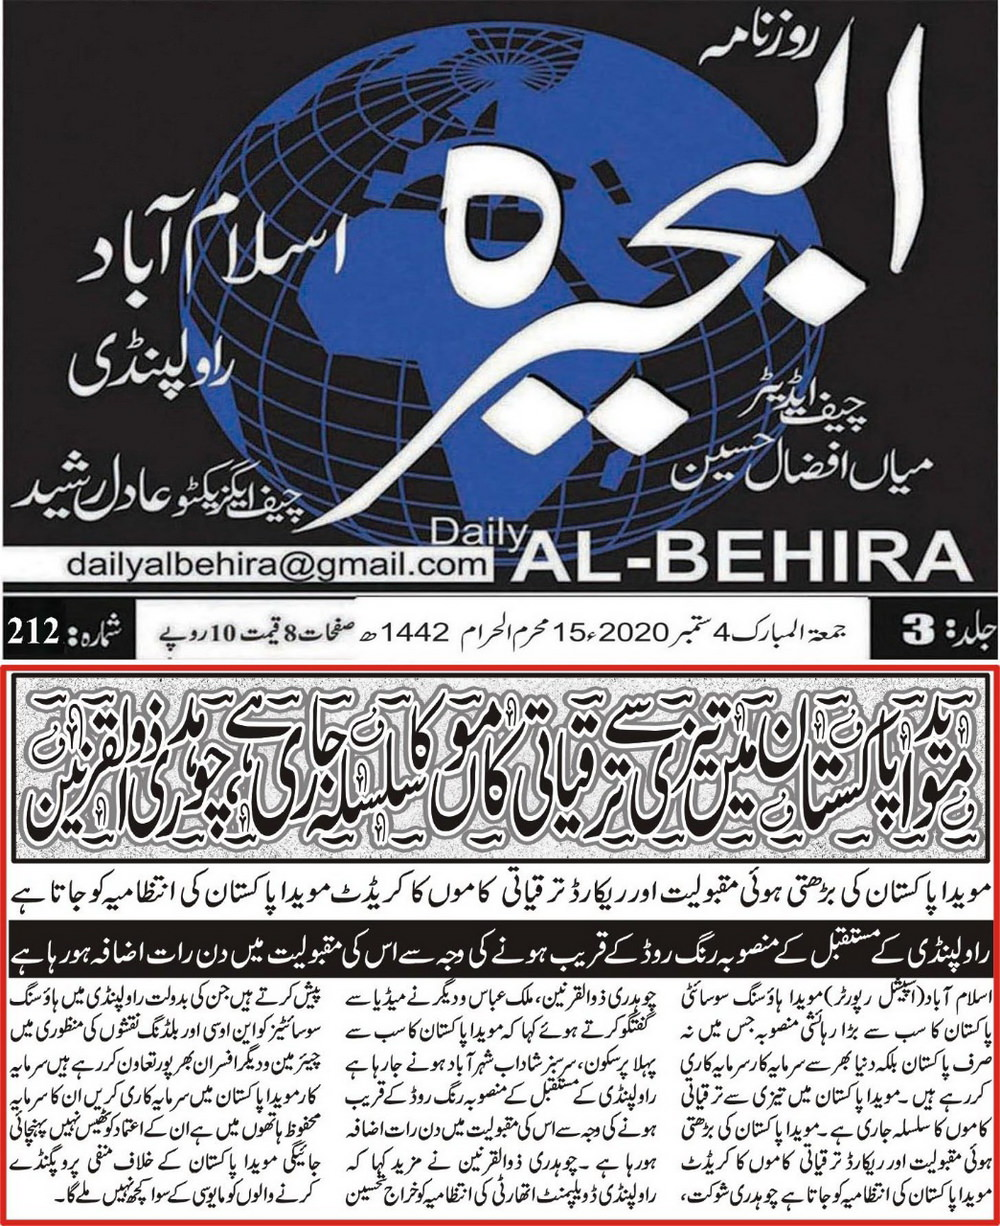 Mivida in Al-behira news paper